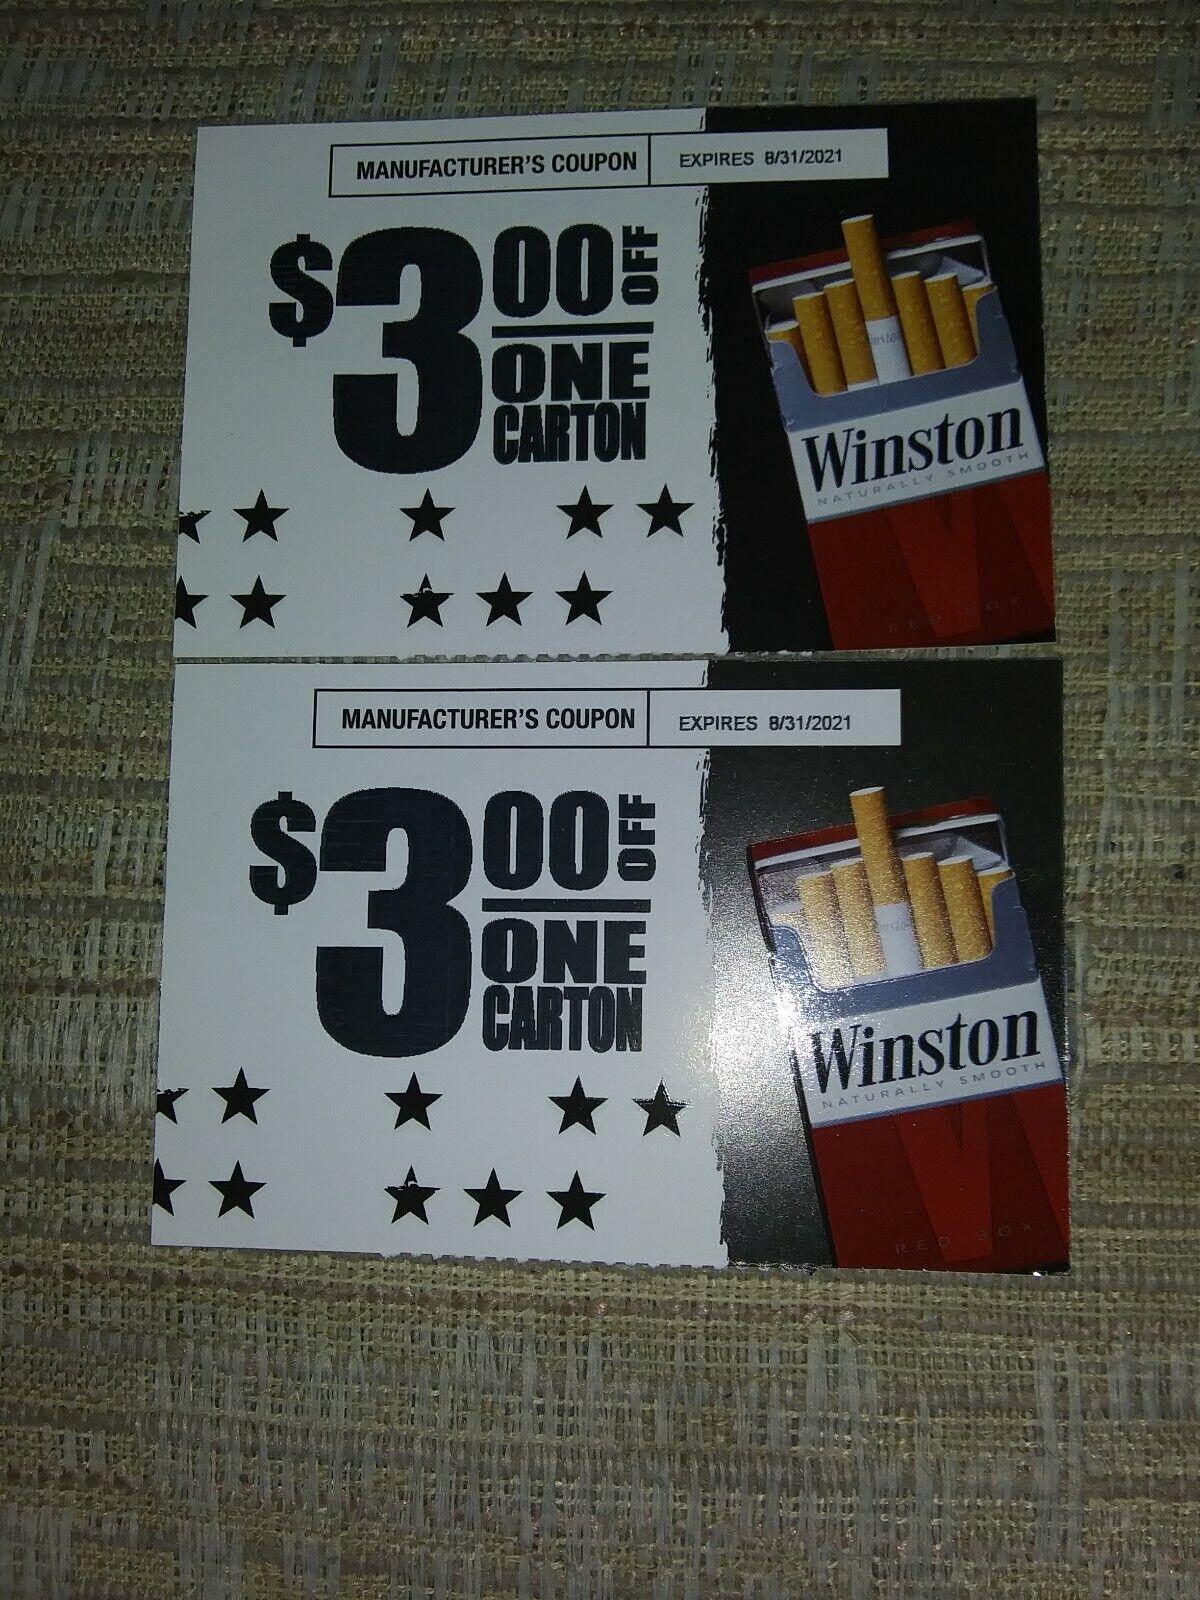 2 WINSTON, 2 3.00 OFF A CARTON OF ANY STYLE WINSTON, EXPIRES 11/30/2021 - $2.40